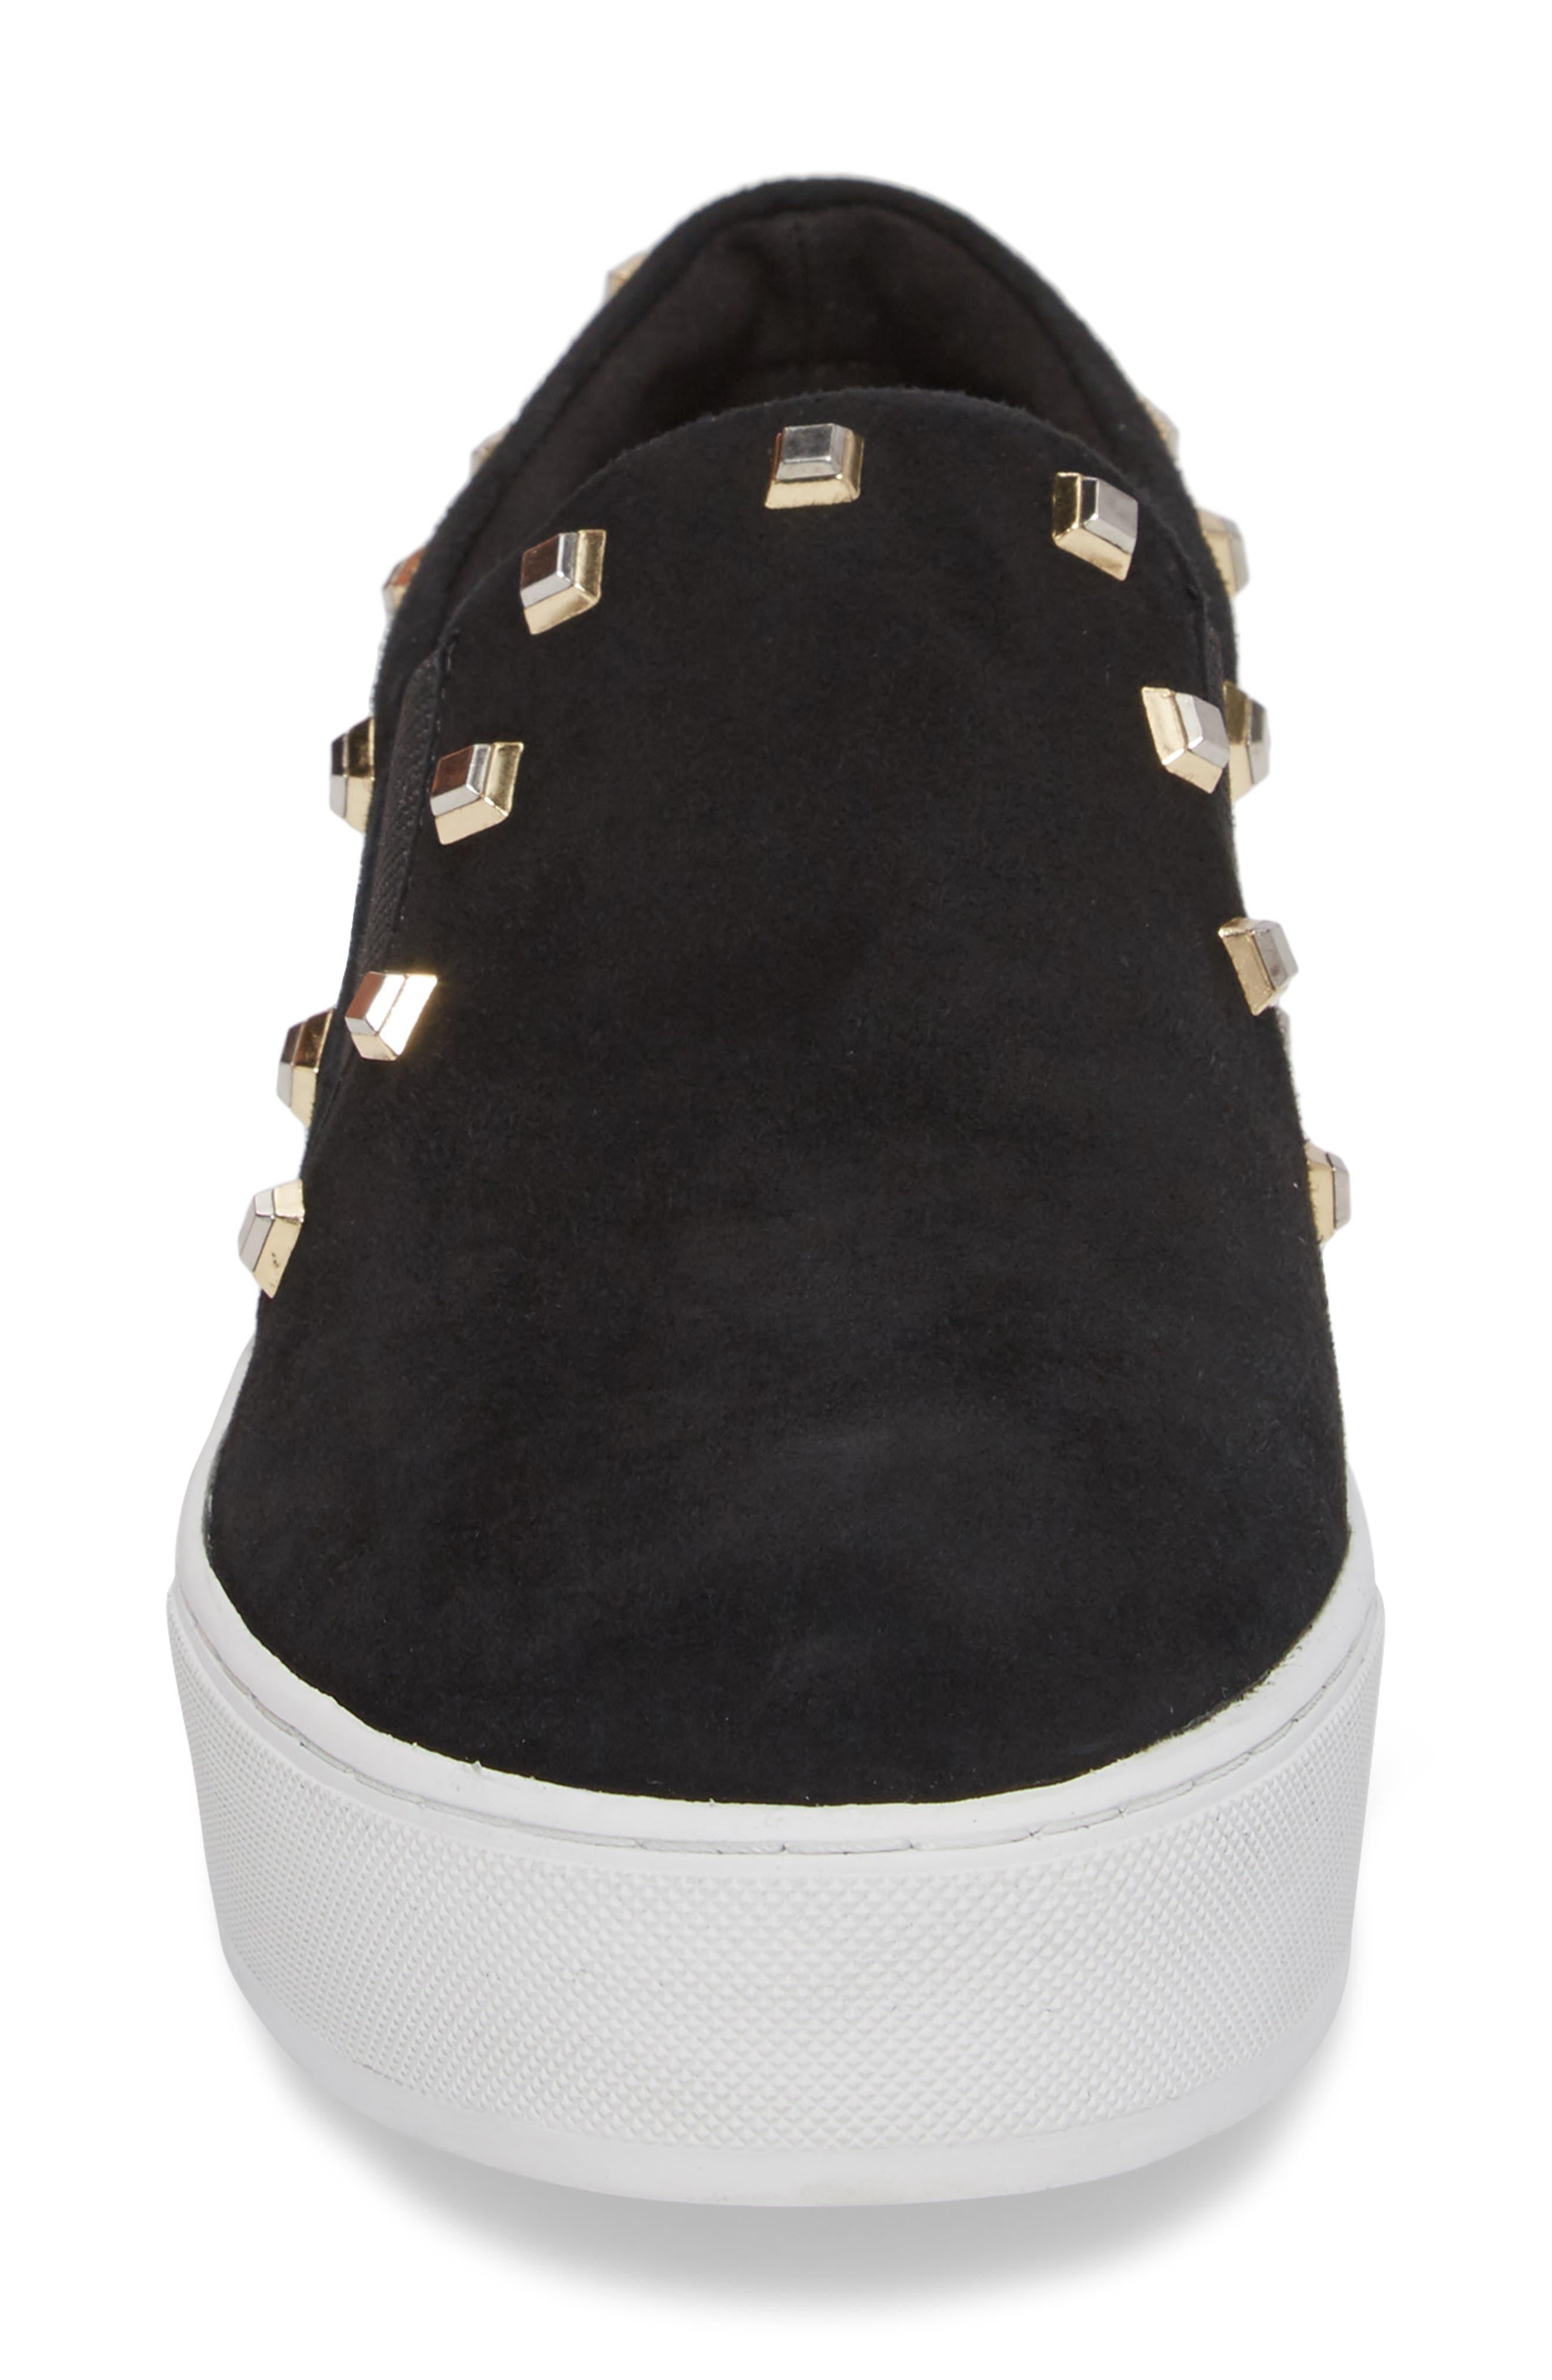 Nora Stud Platform Sneaker,                             Alternate thumbnail 4, color,                             Black Suede